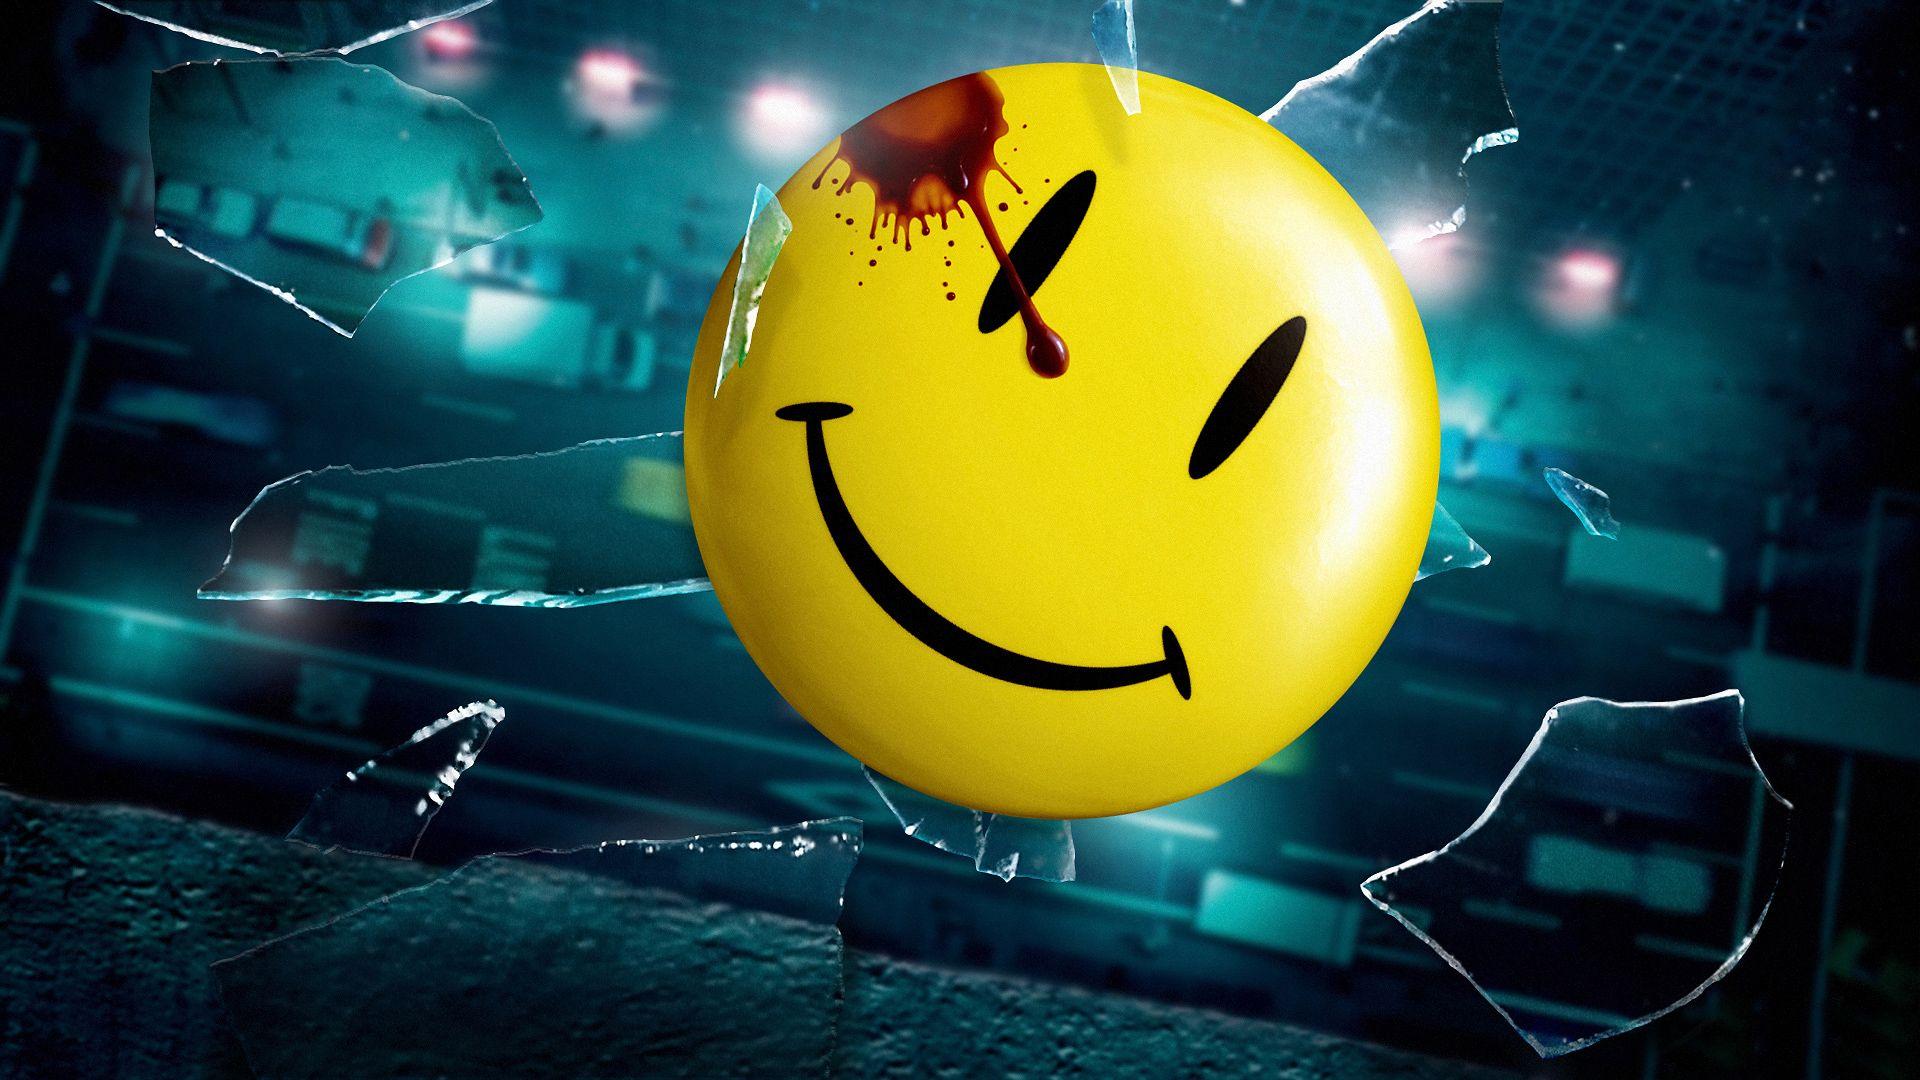 Download smiley face wallpaper hd wallpaper - Hd Wallpapers Watchmen Smiley Hd Wallpaper 2080 Wallpaper Wall Height Com